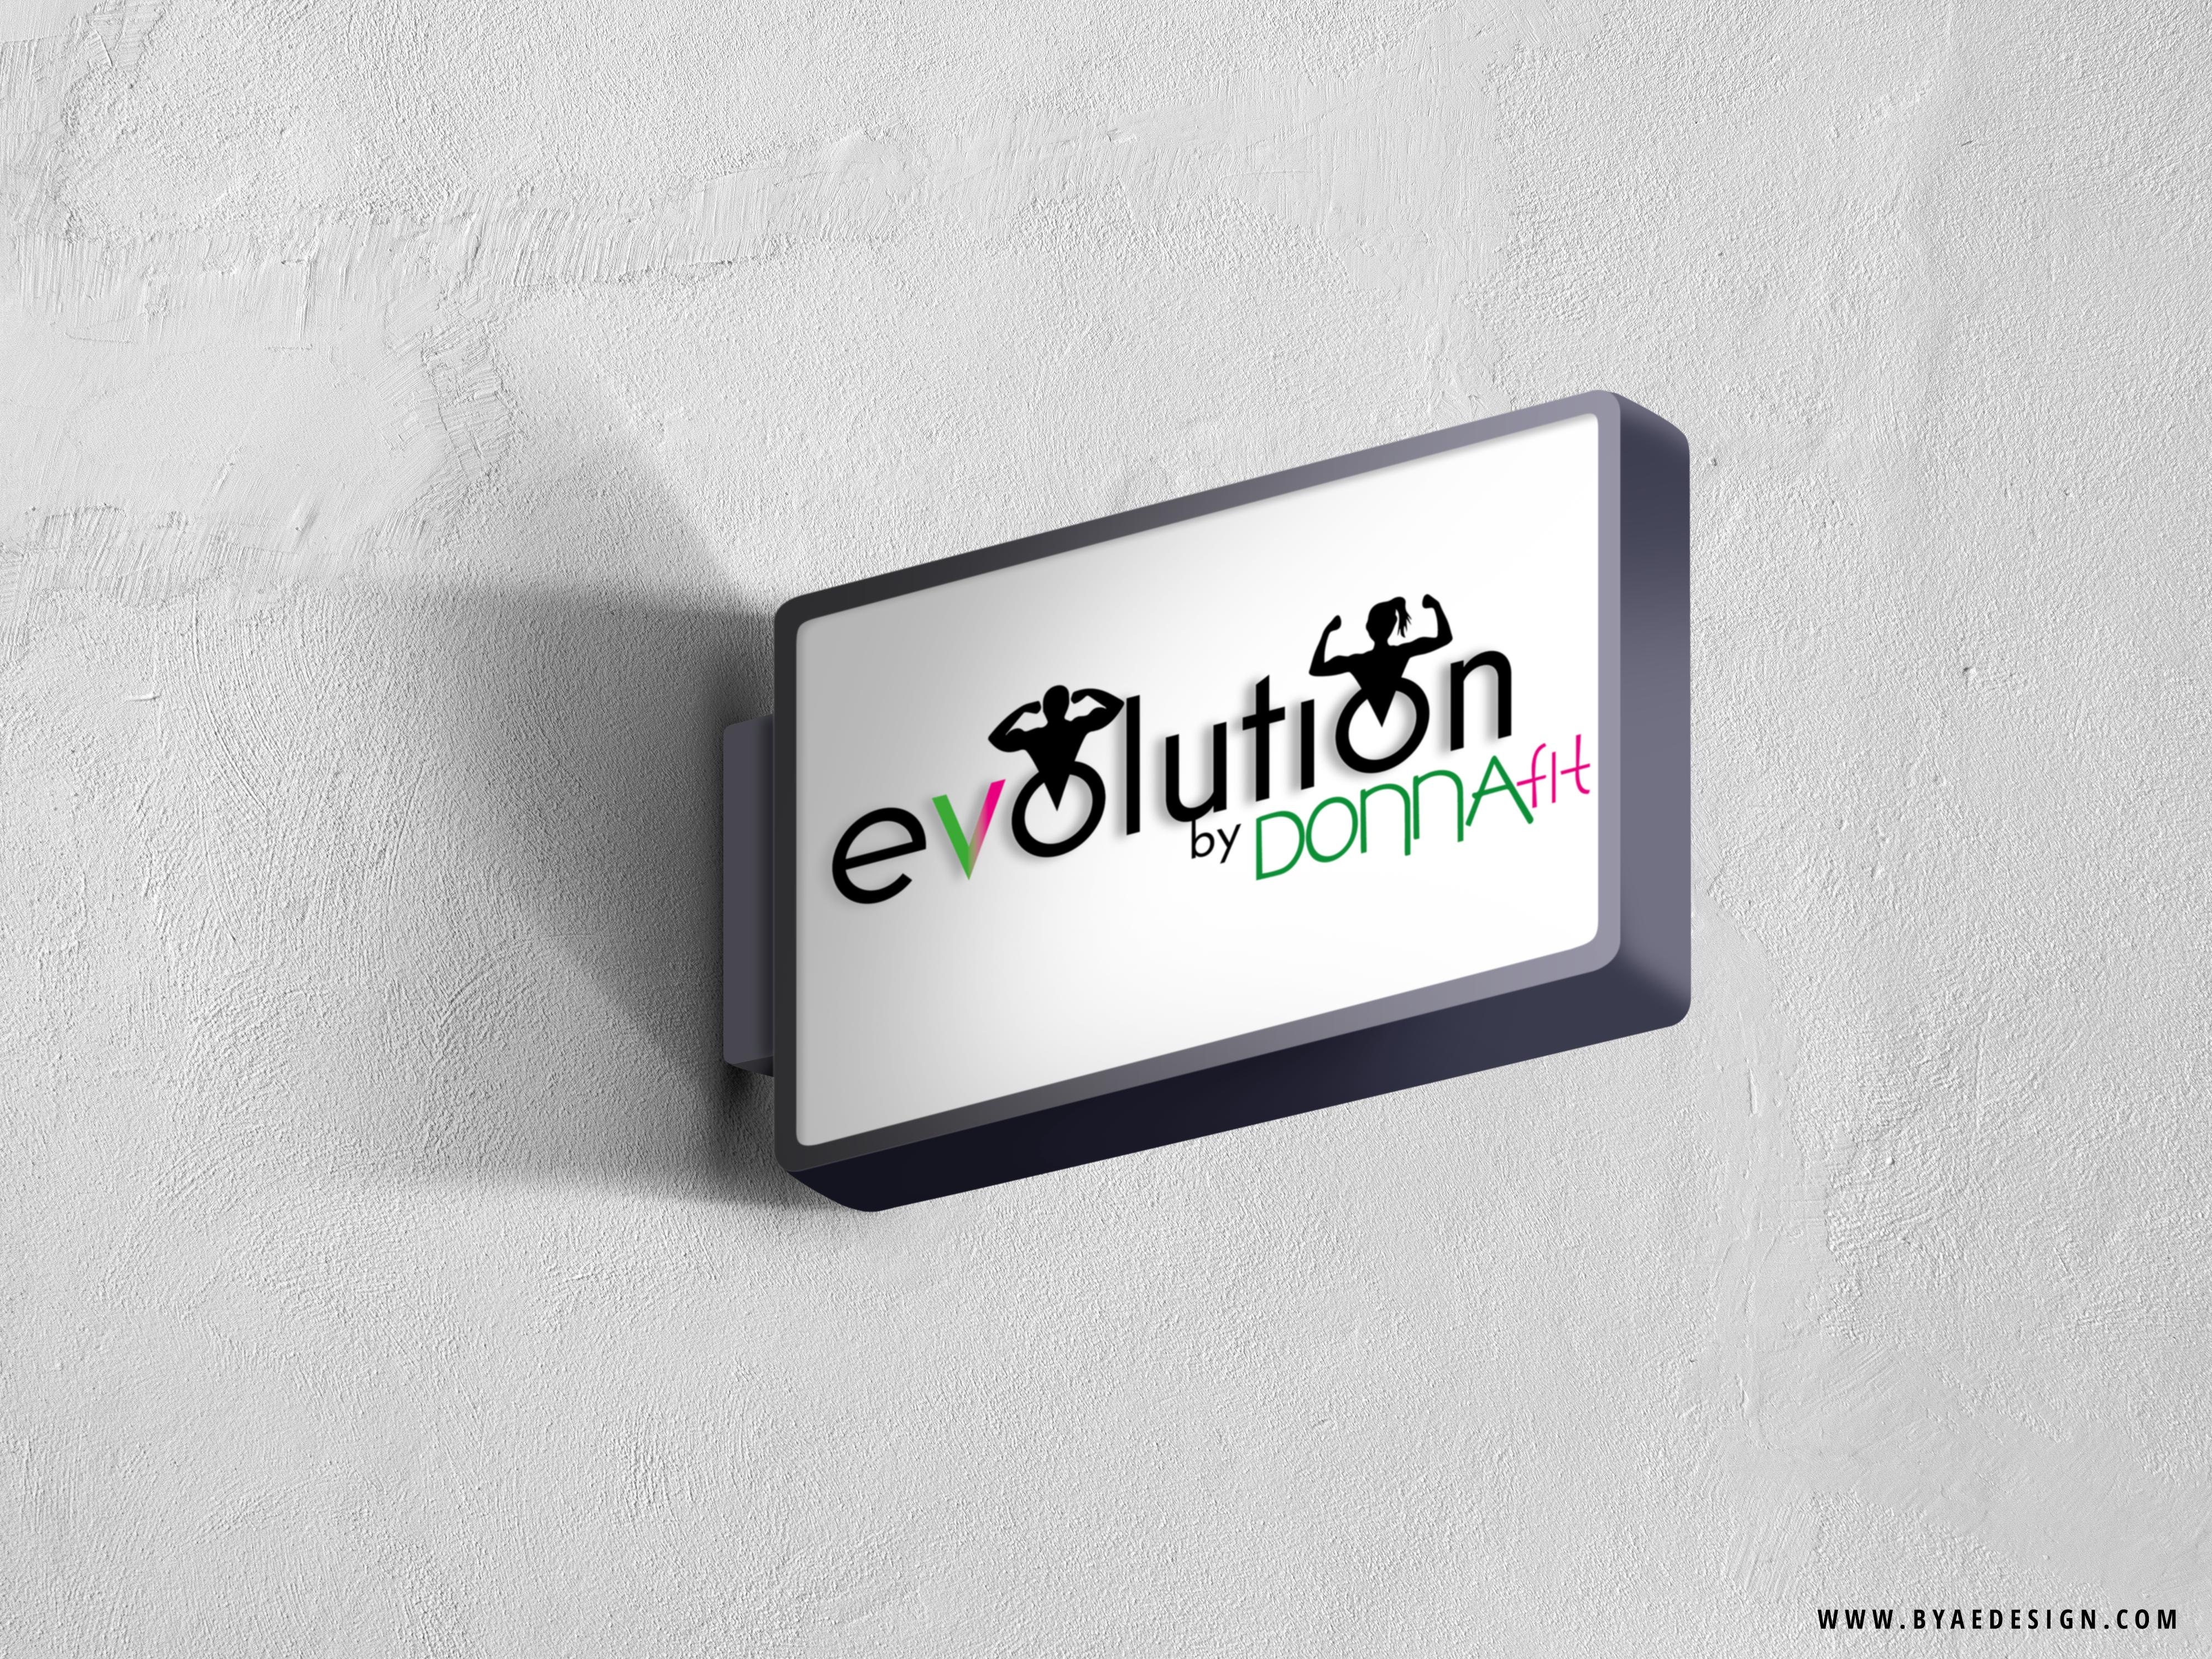 EVOLUTION by DonnaFit